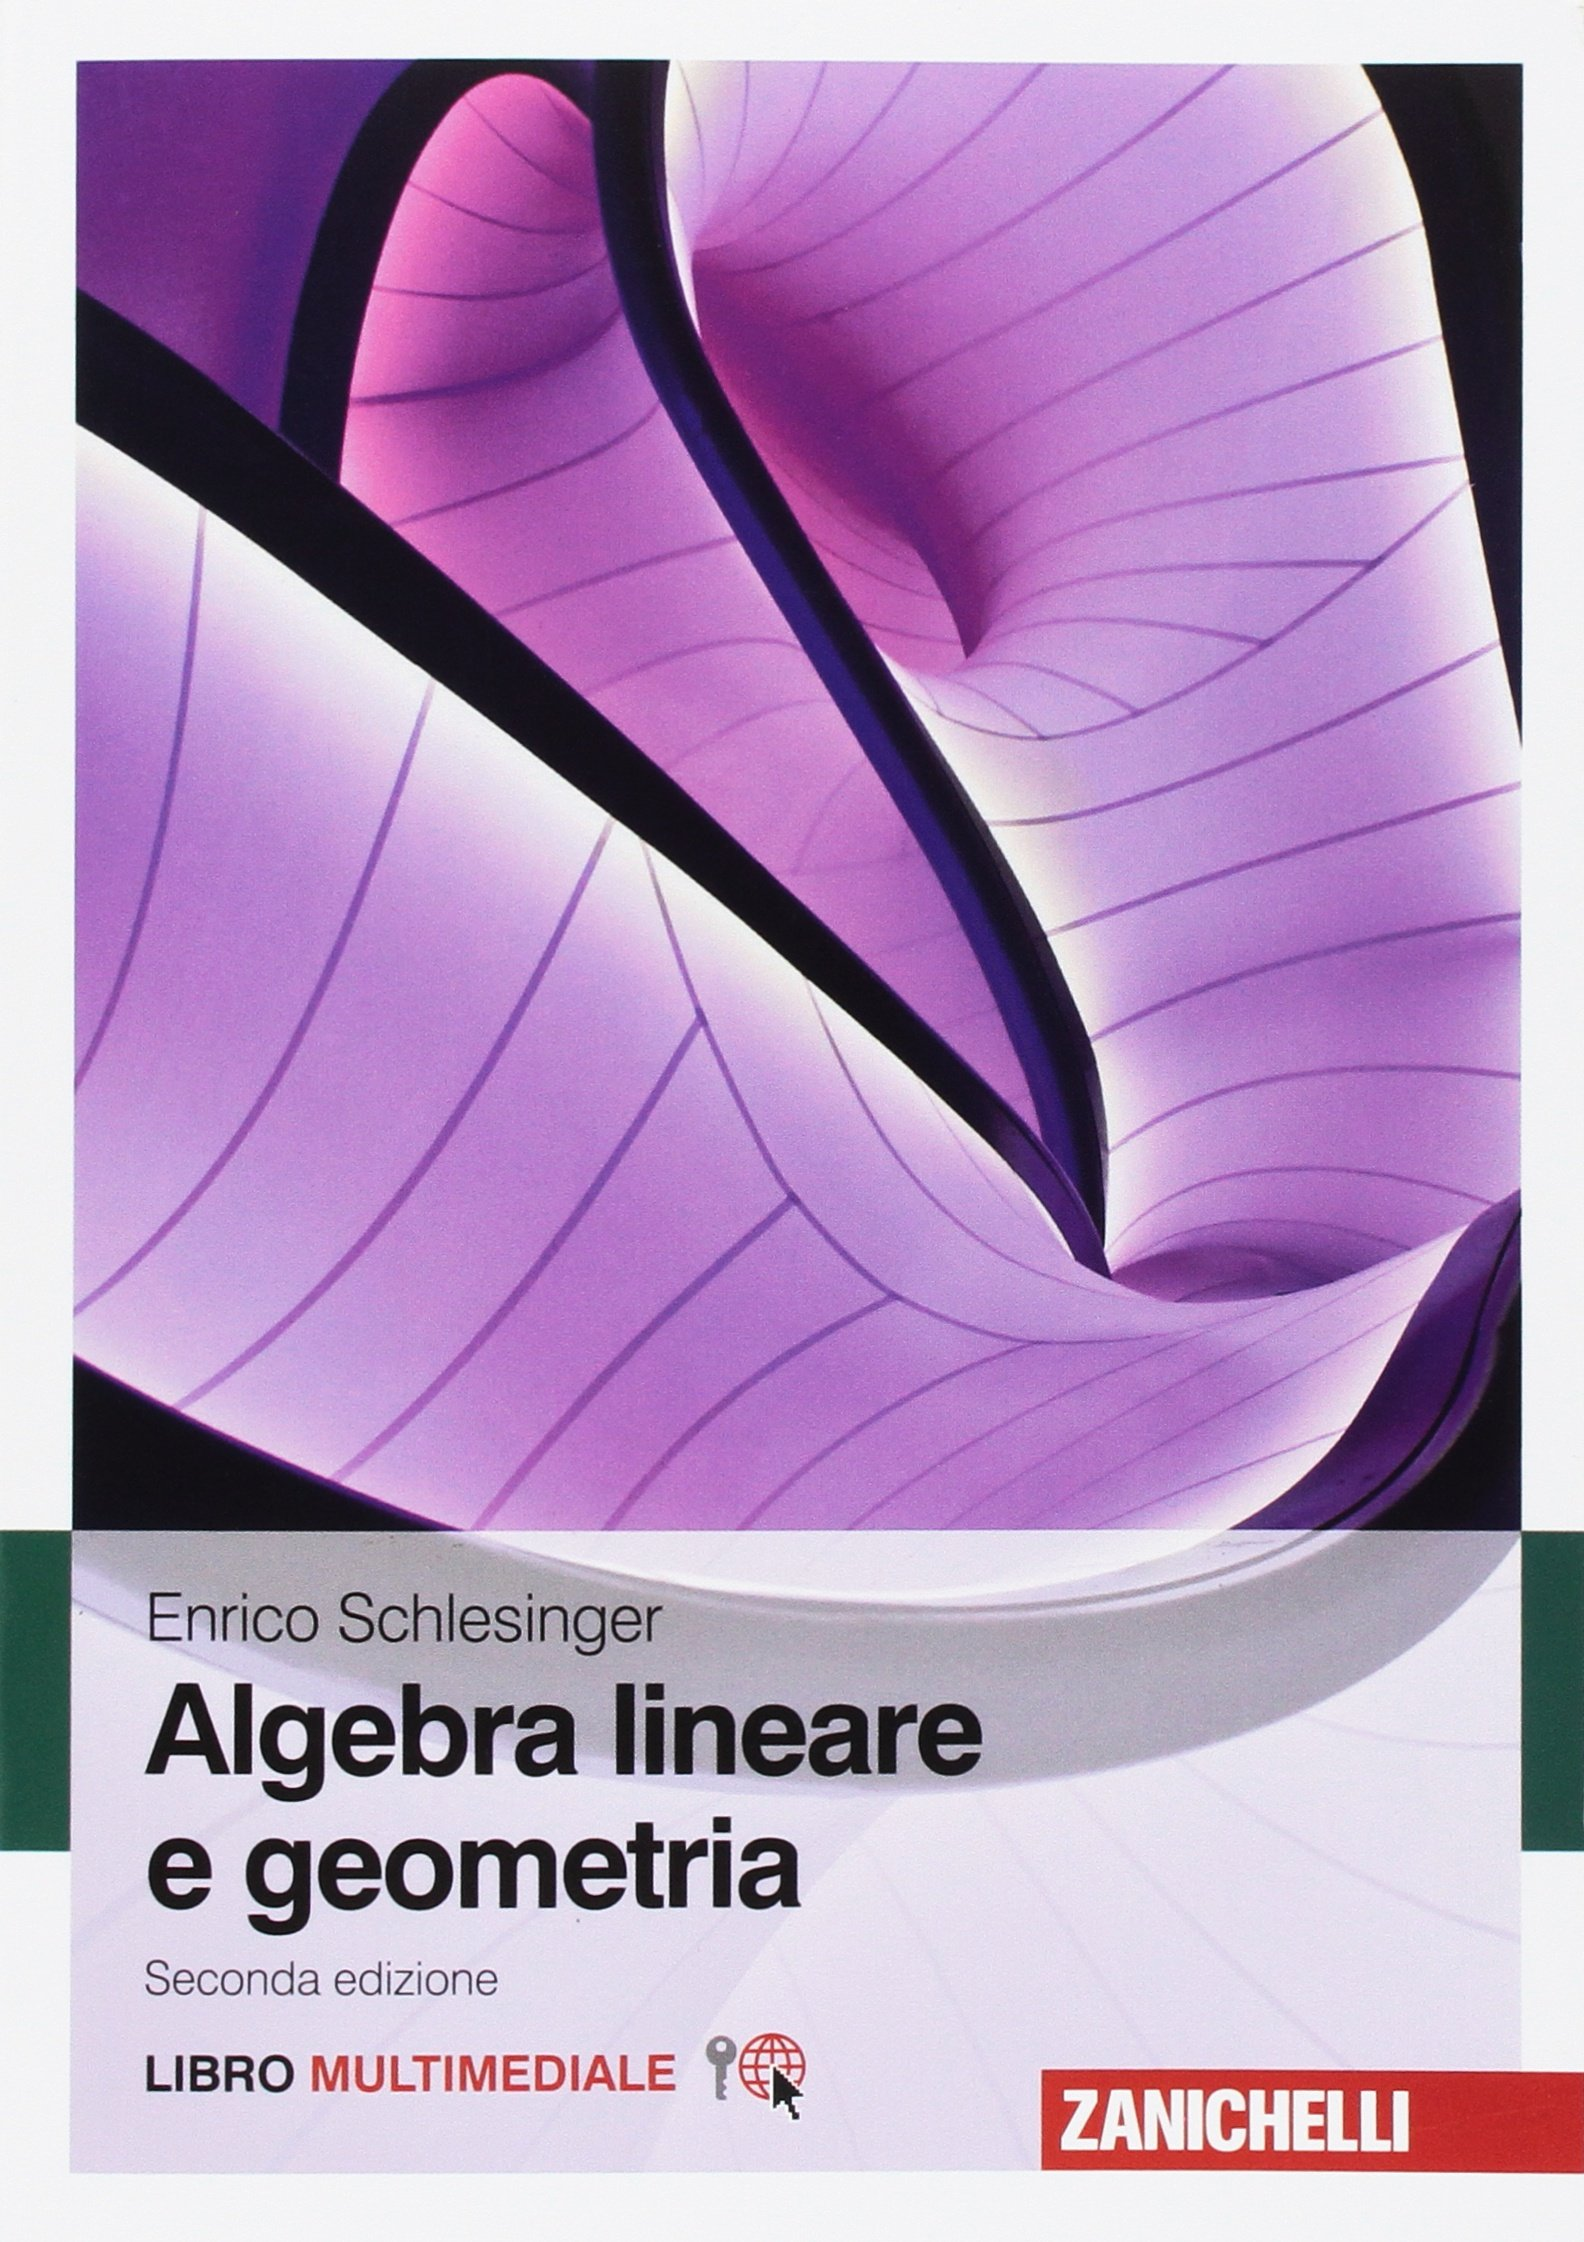 Algebra lineare zan